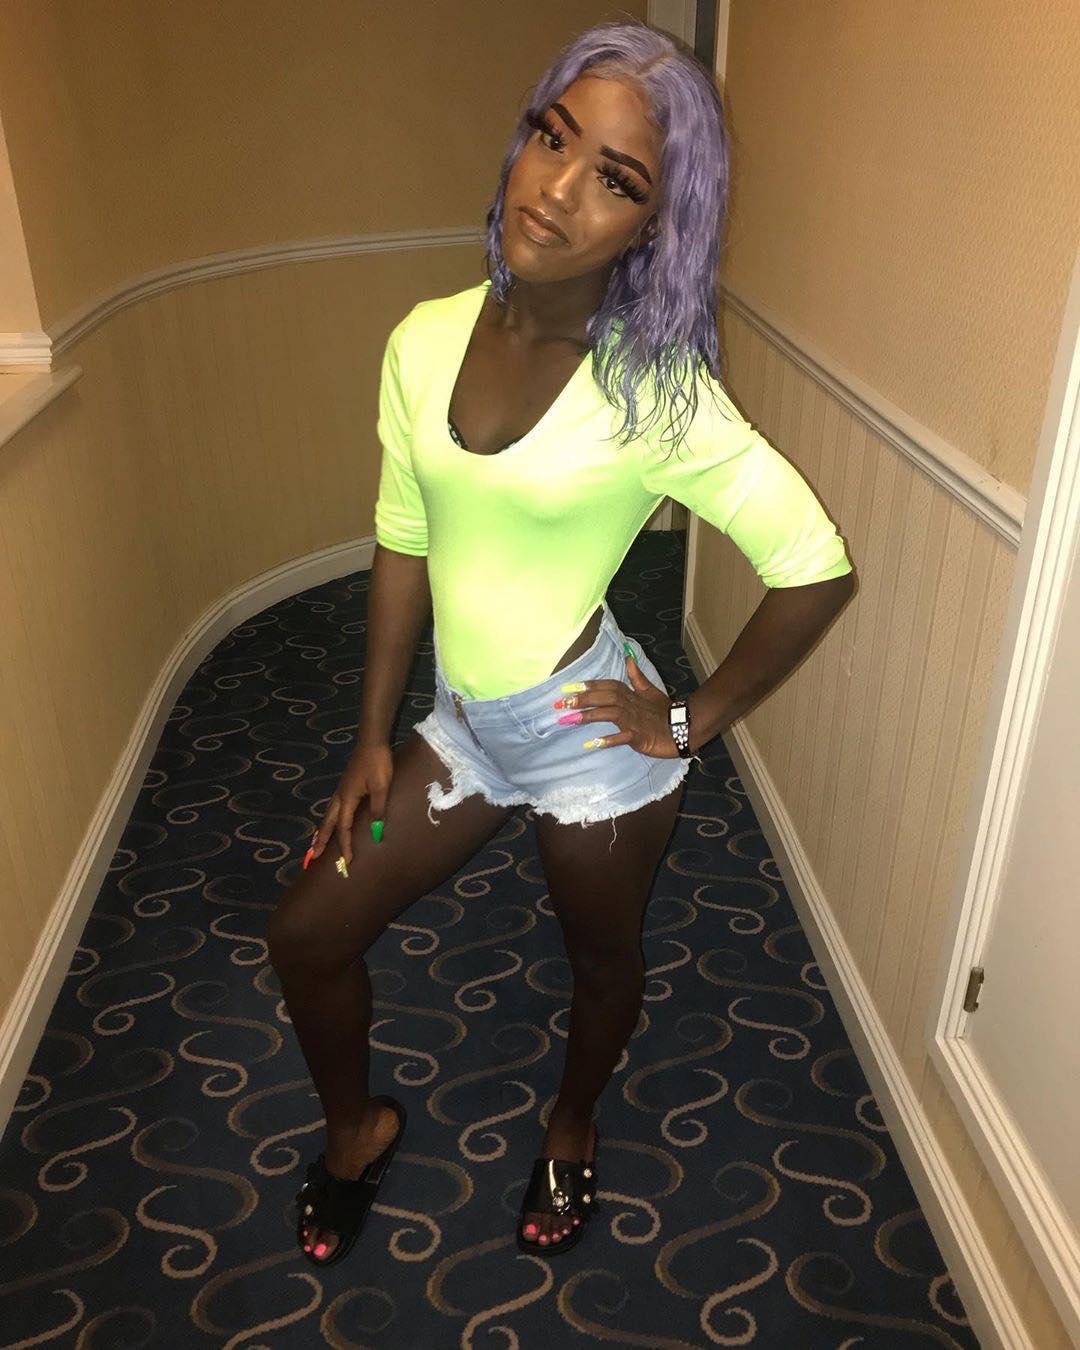 Mackerel Now Among Top Female Dancehall Artistes - Urban Islandz